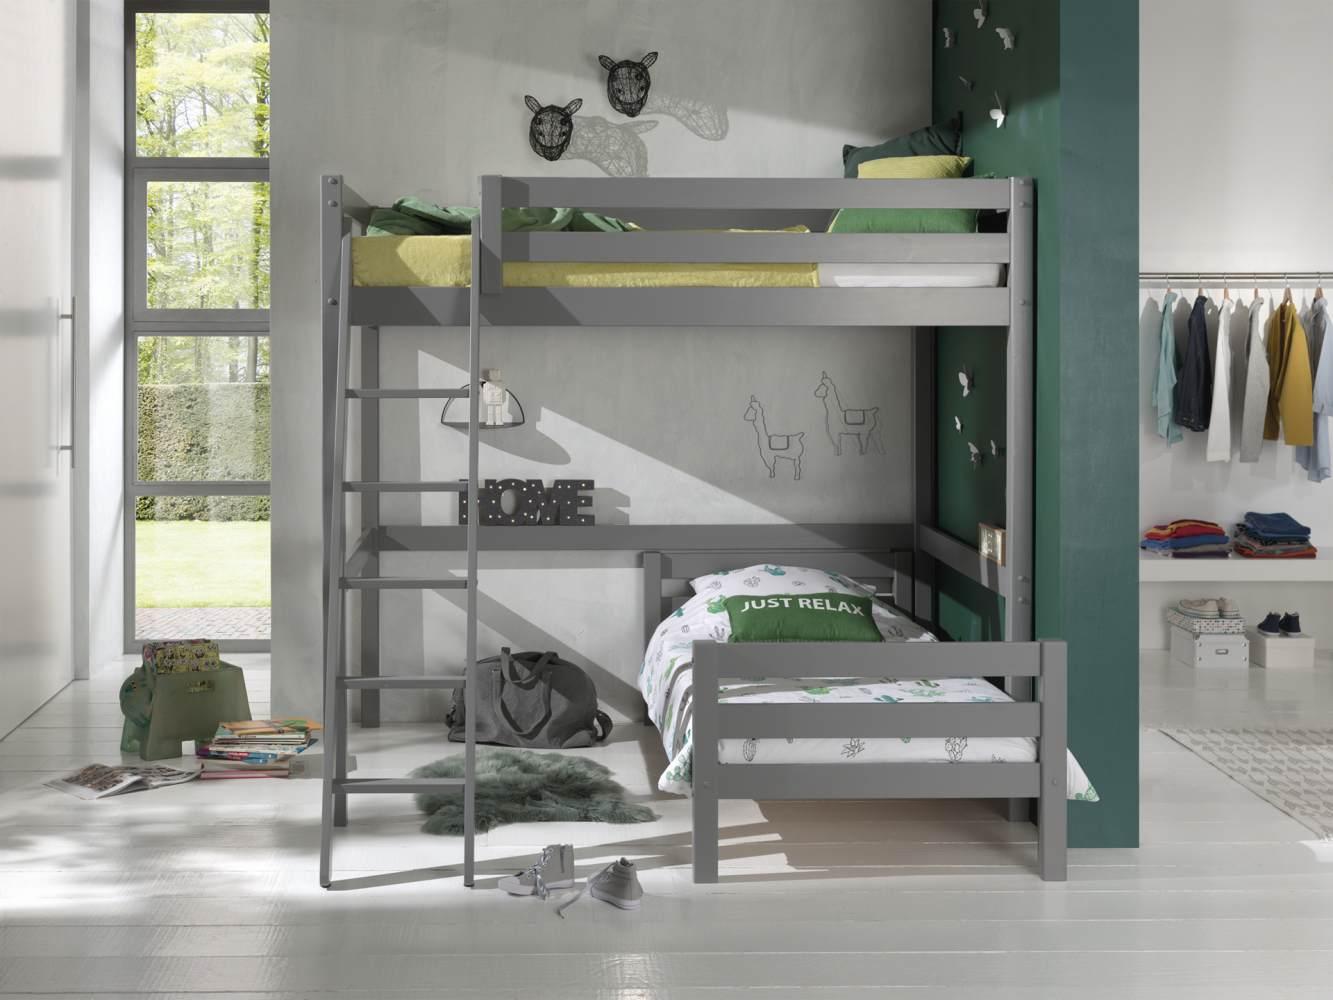 Vipack Winkel Hochbett mit 2 Liegeflächen 140/90 x 200 cm, Ausf. grau lackiert Bild 1